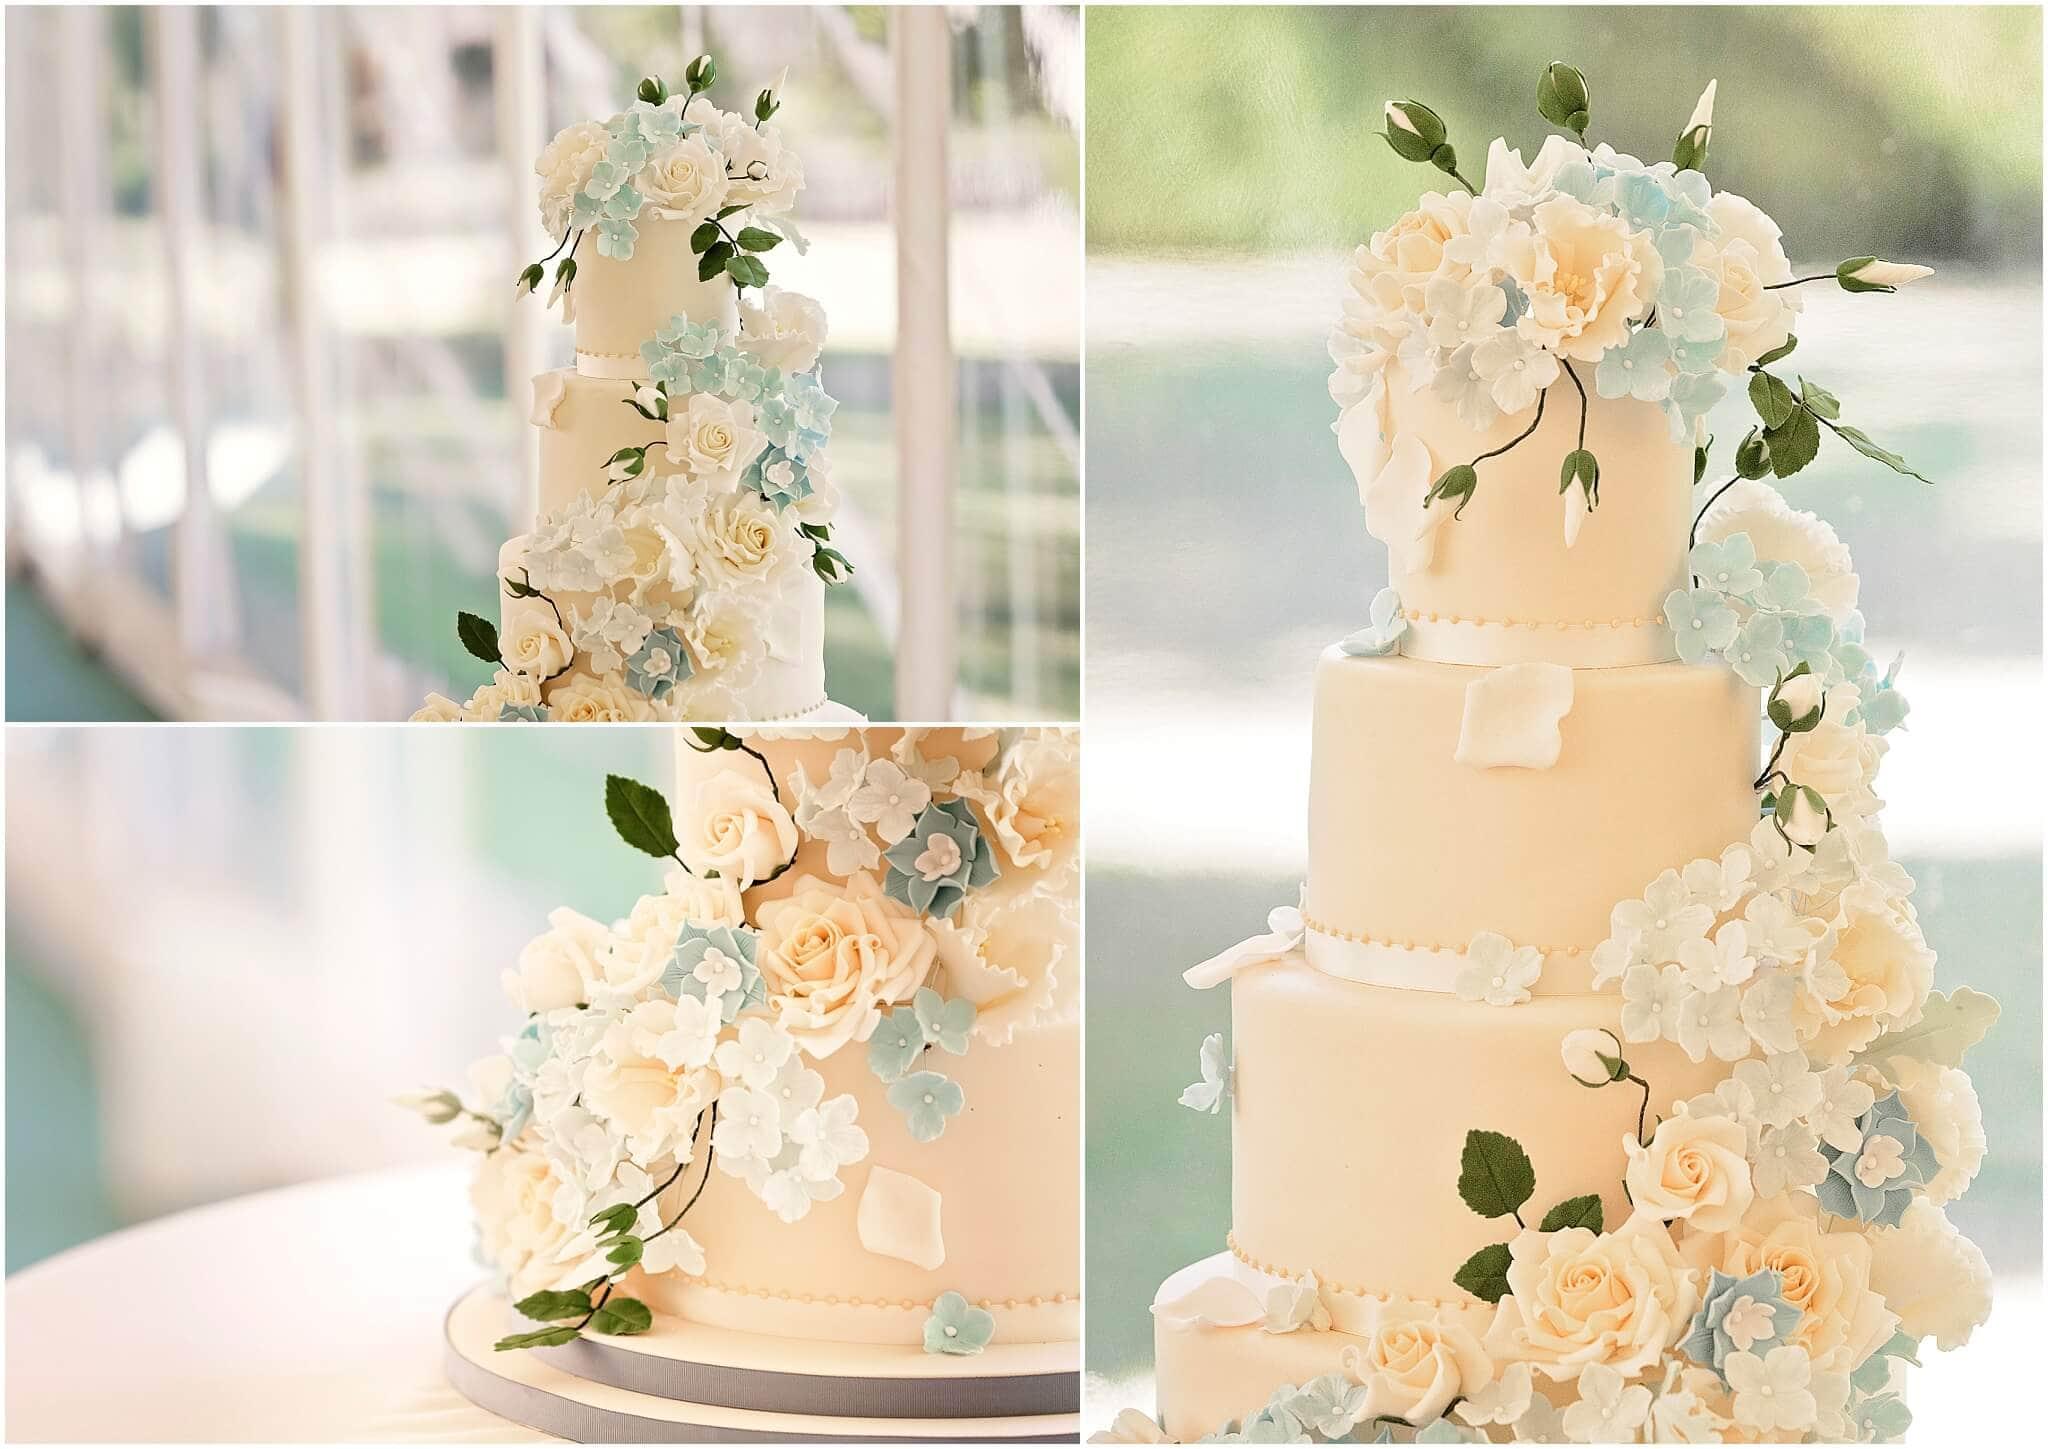 Pretty Tasty wedding cakes